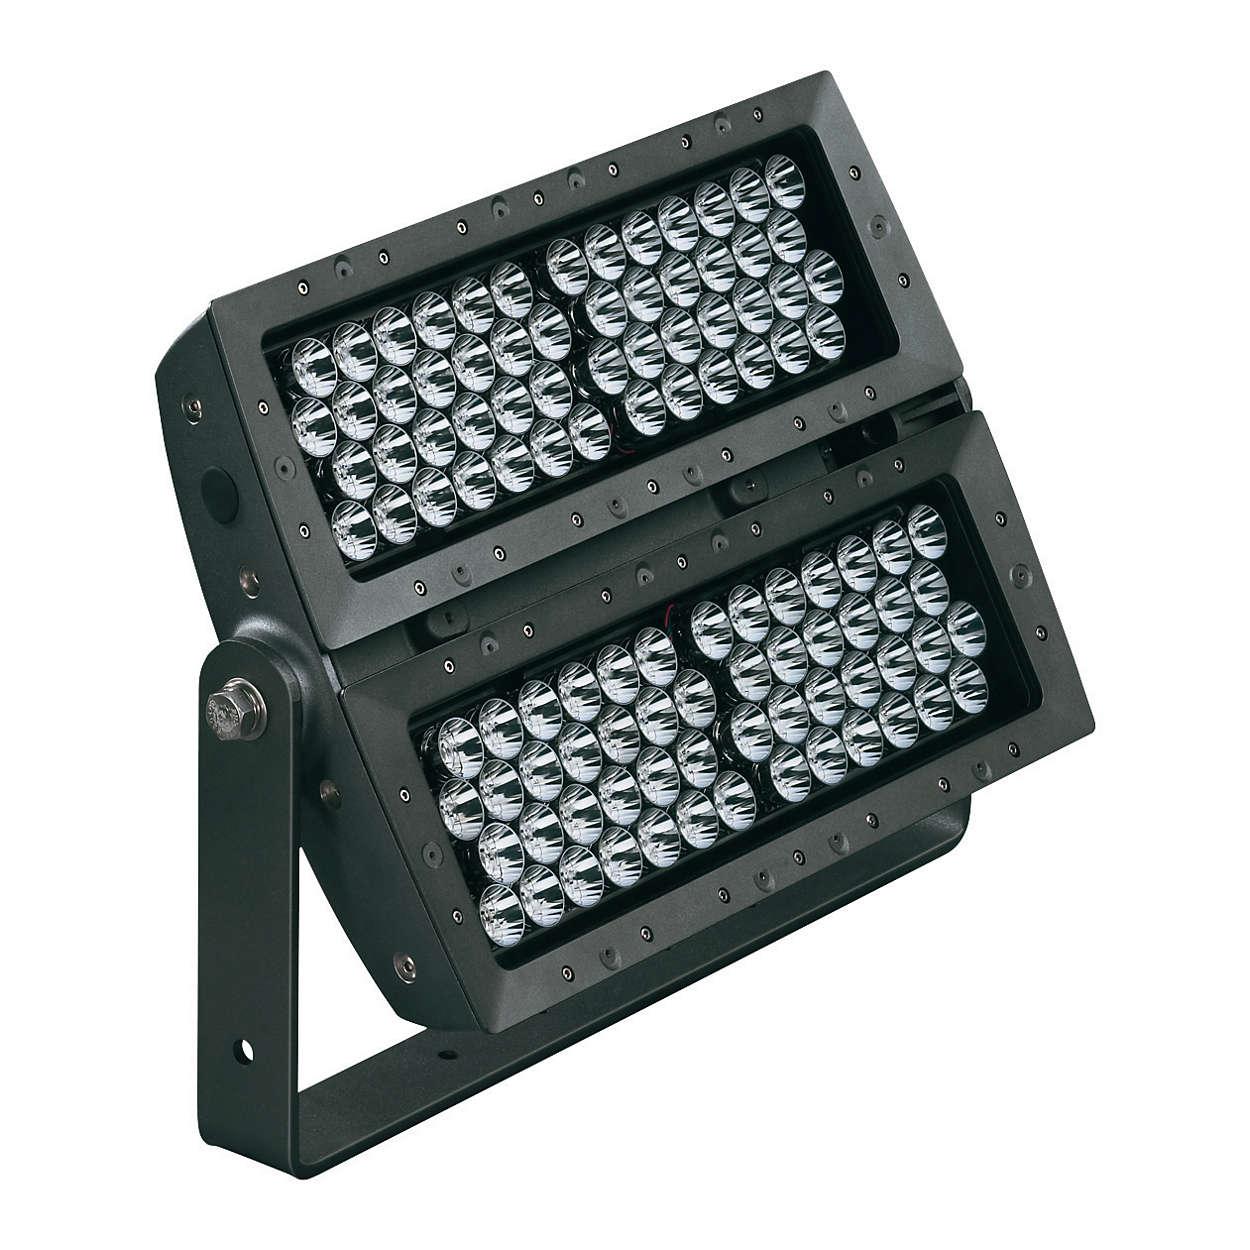 ColorReach Powercore – 특징적인 건물 전면과 구조물을 위한 차세대 LED 투광 조명